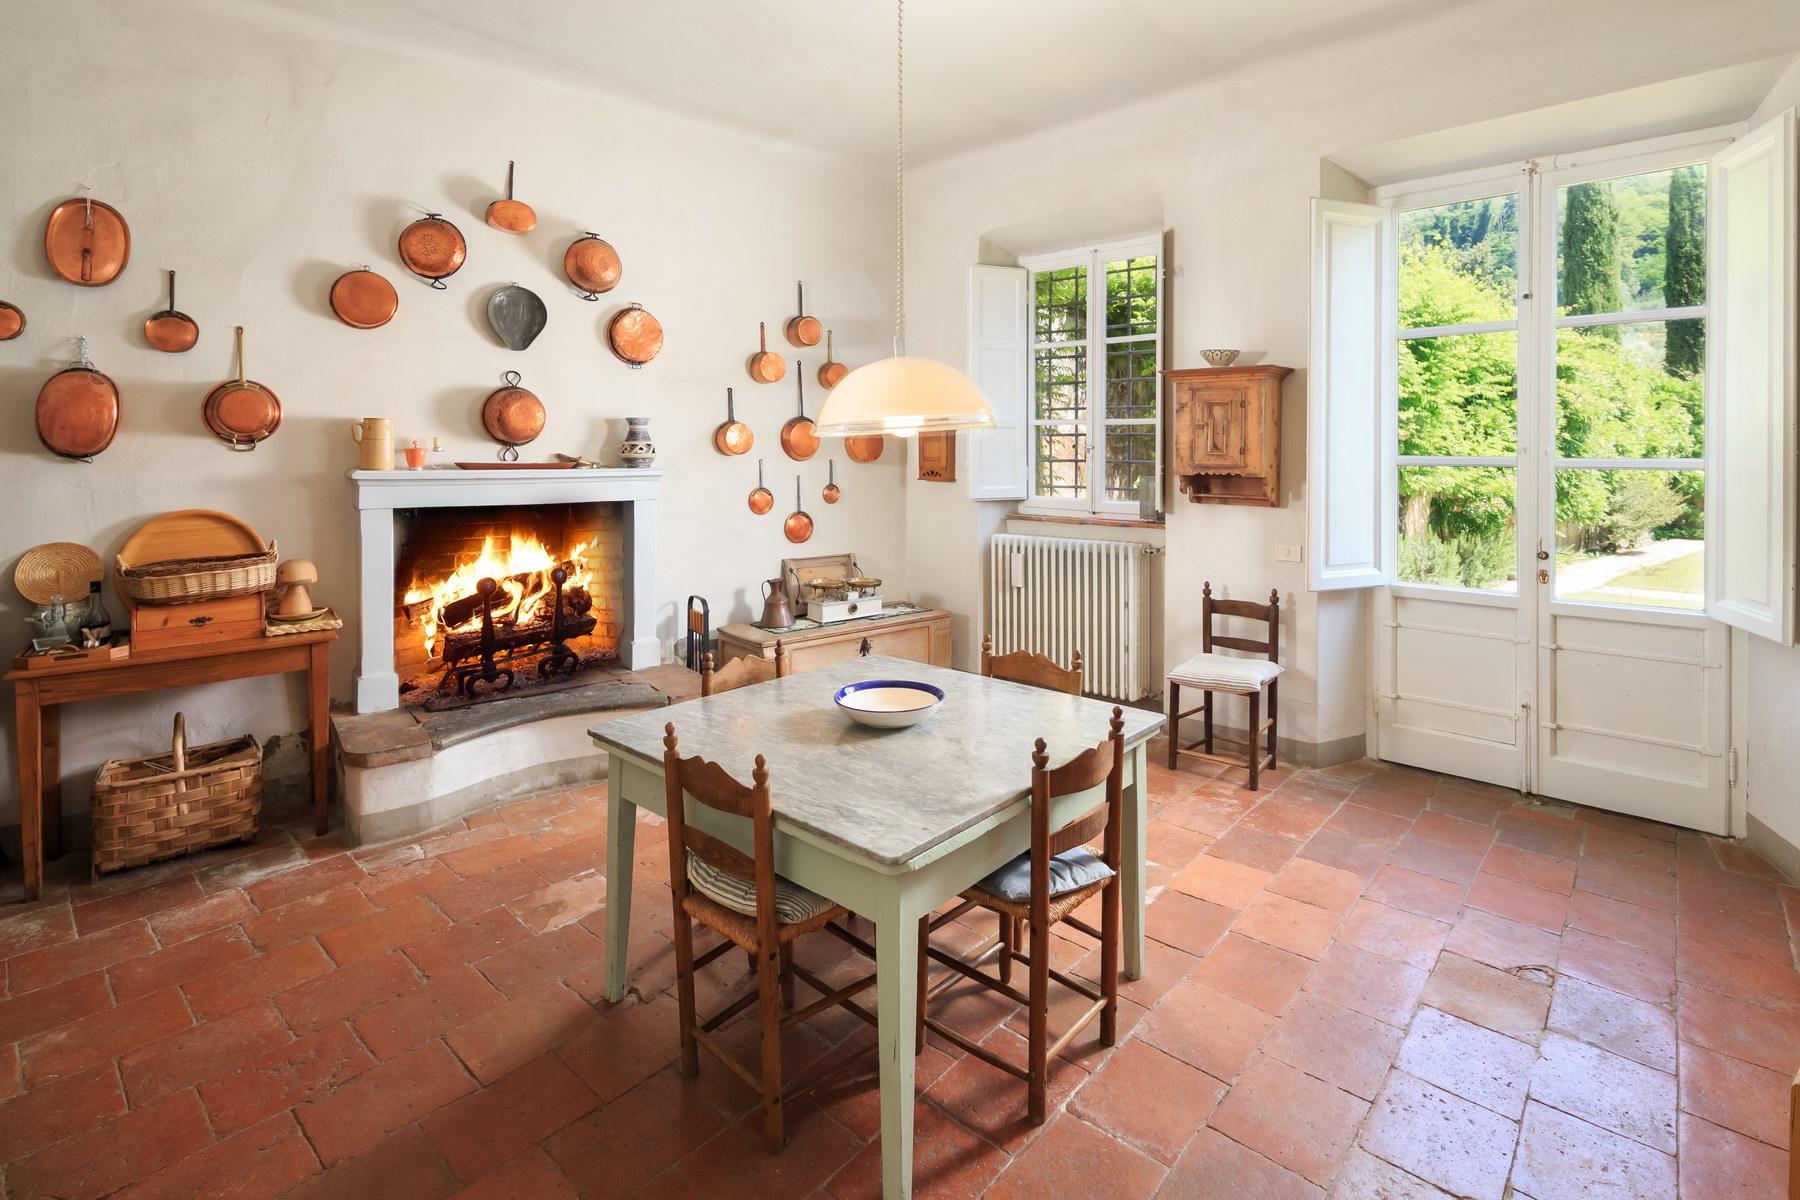 Villa in Vendita a Lucca: 5 locali, 1500 mq - Foto 9